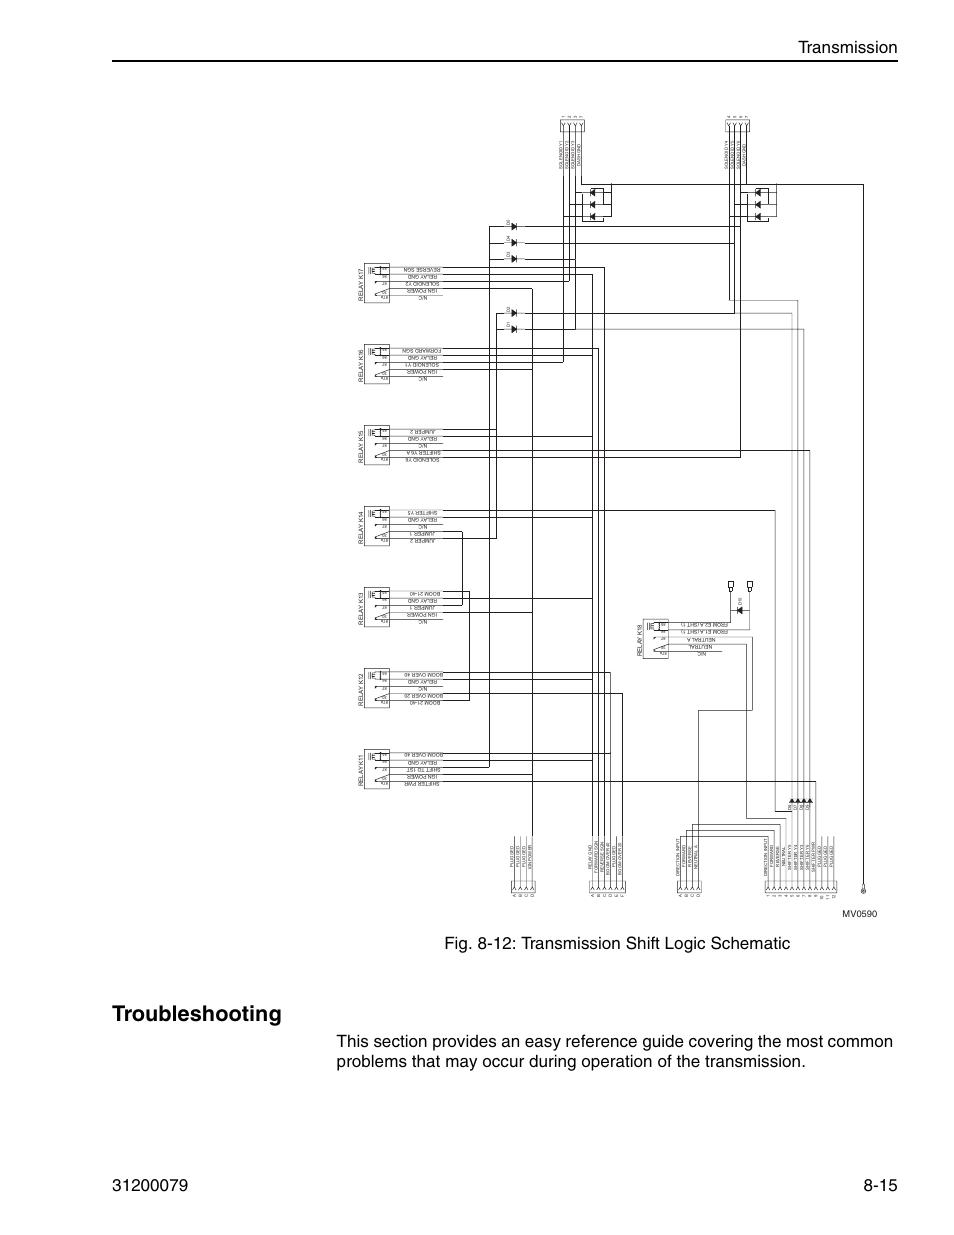 Service brakes | lull 1044c-54 series ii service manual user.